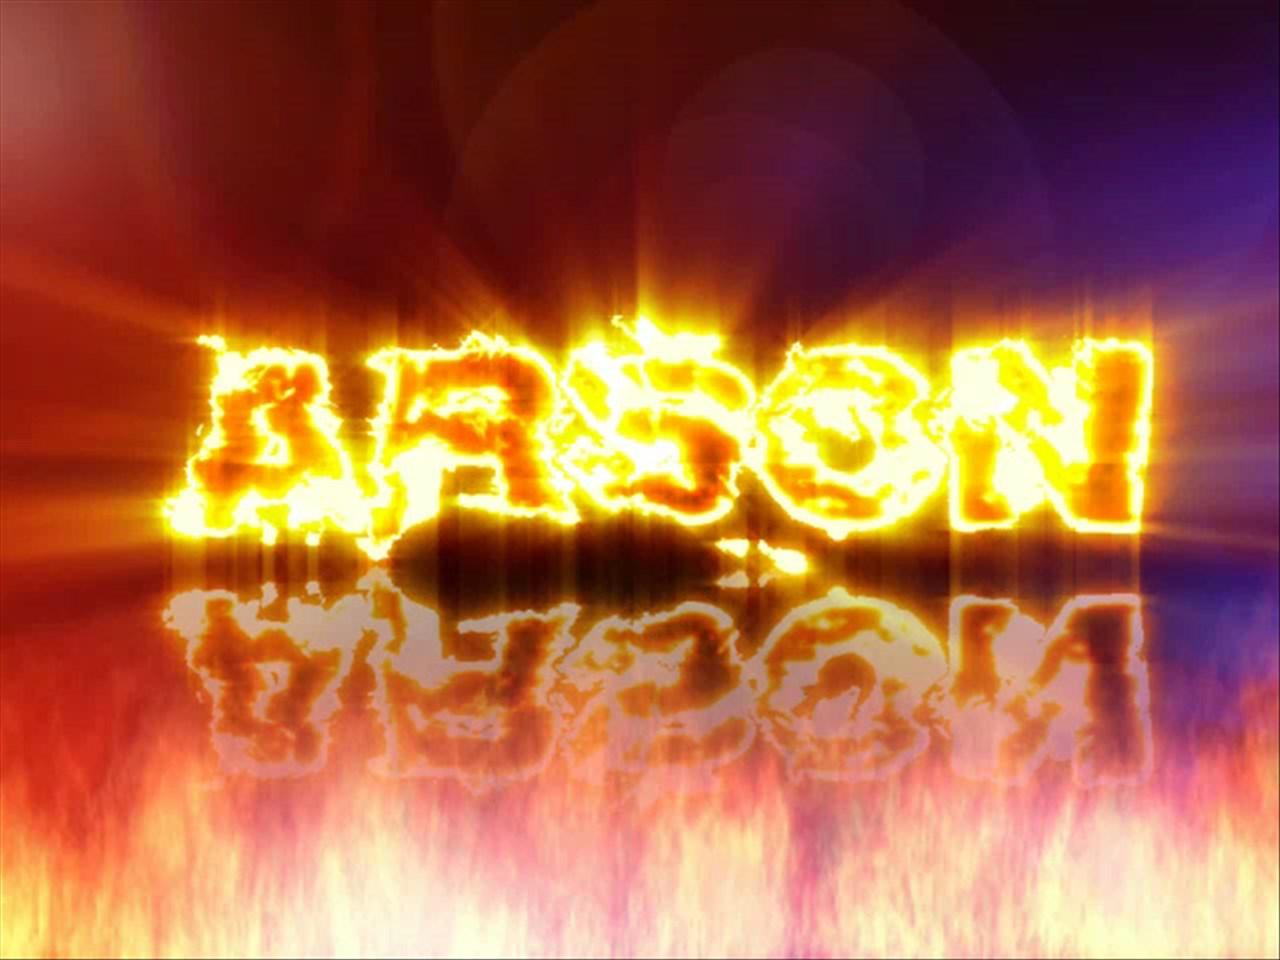 arson_1493303151218.jpg